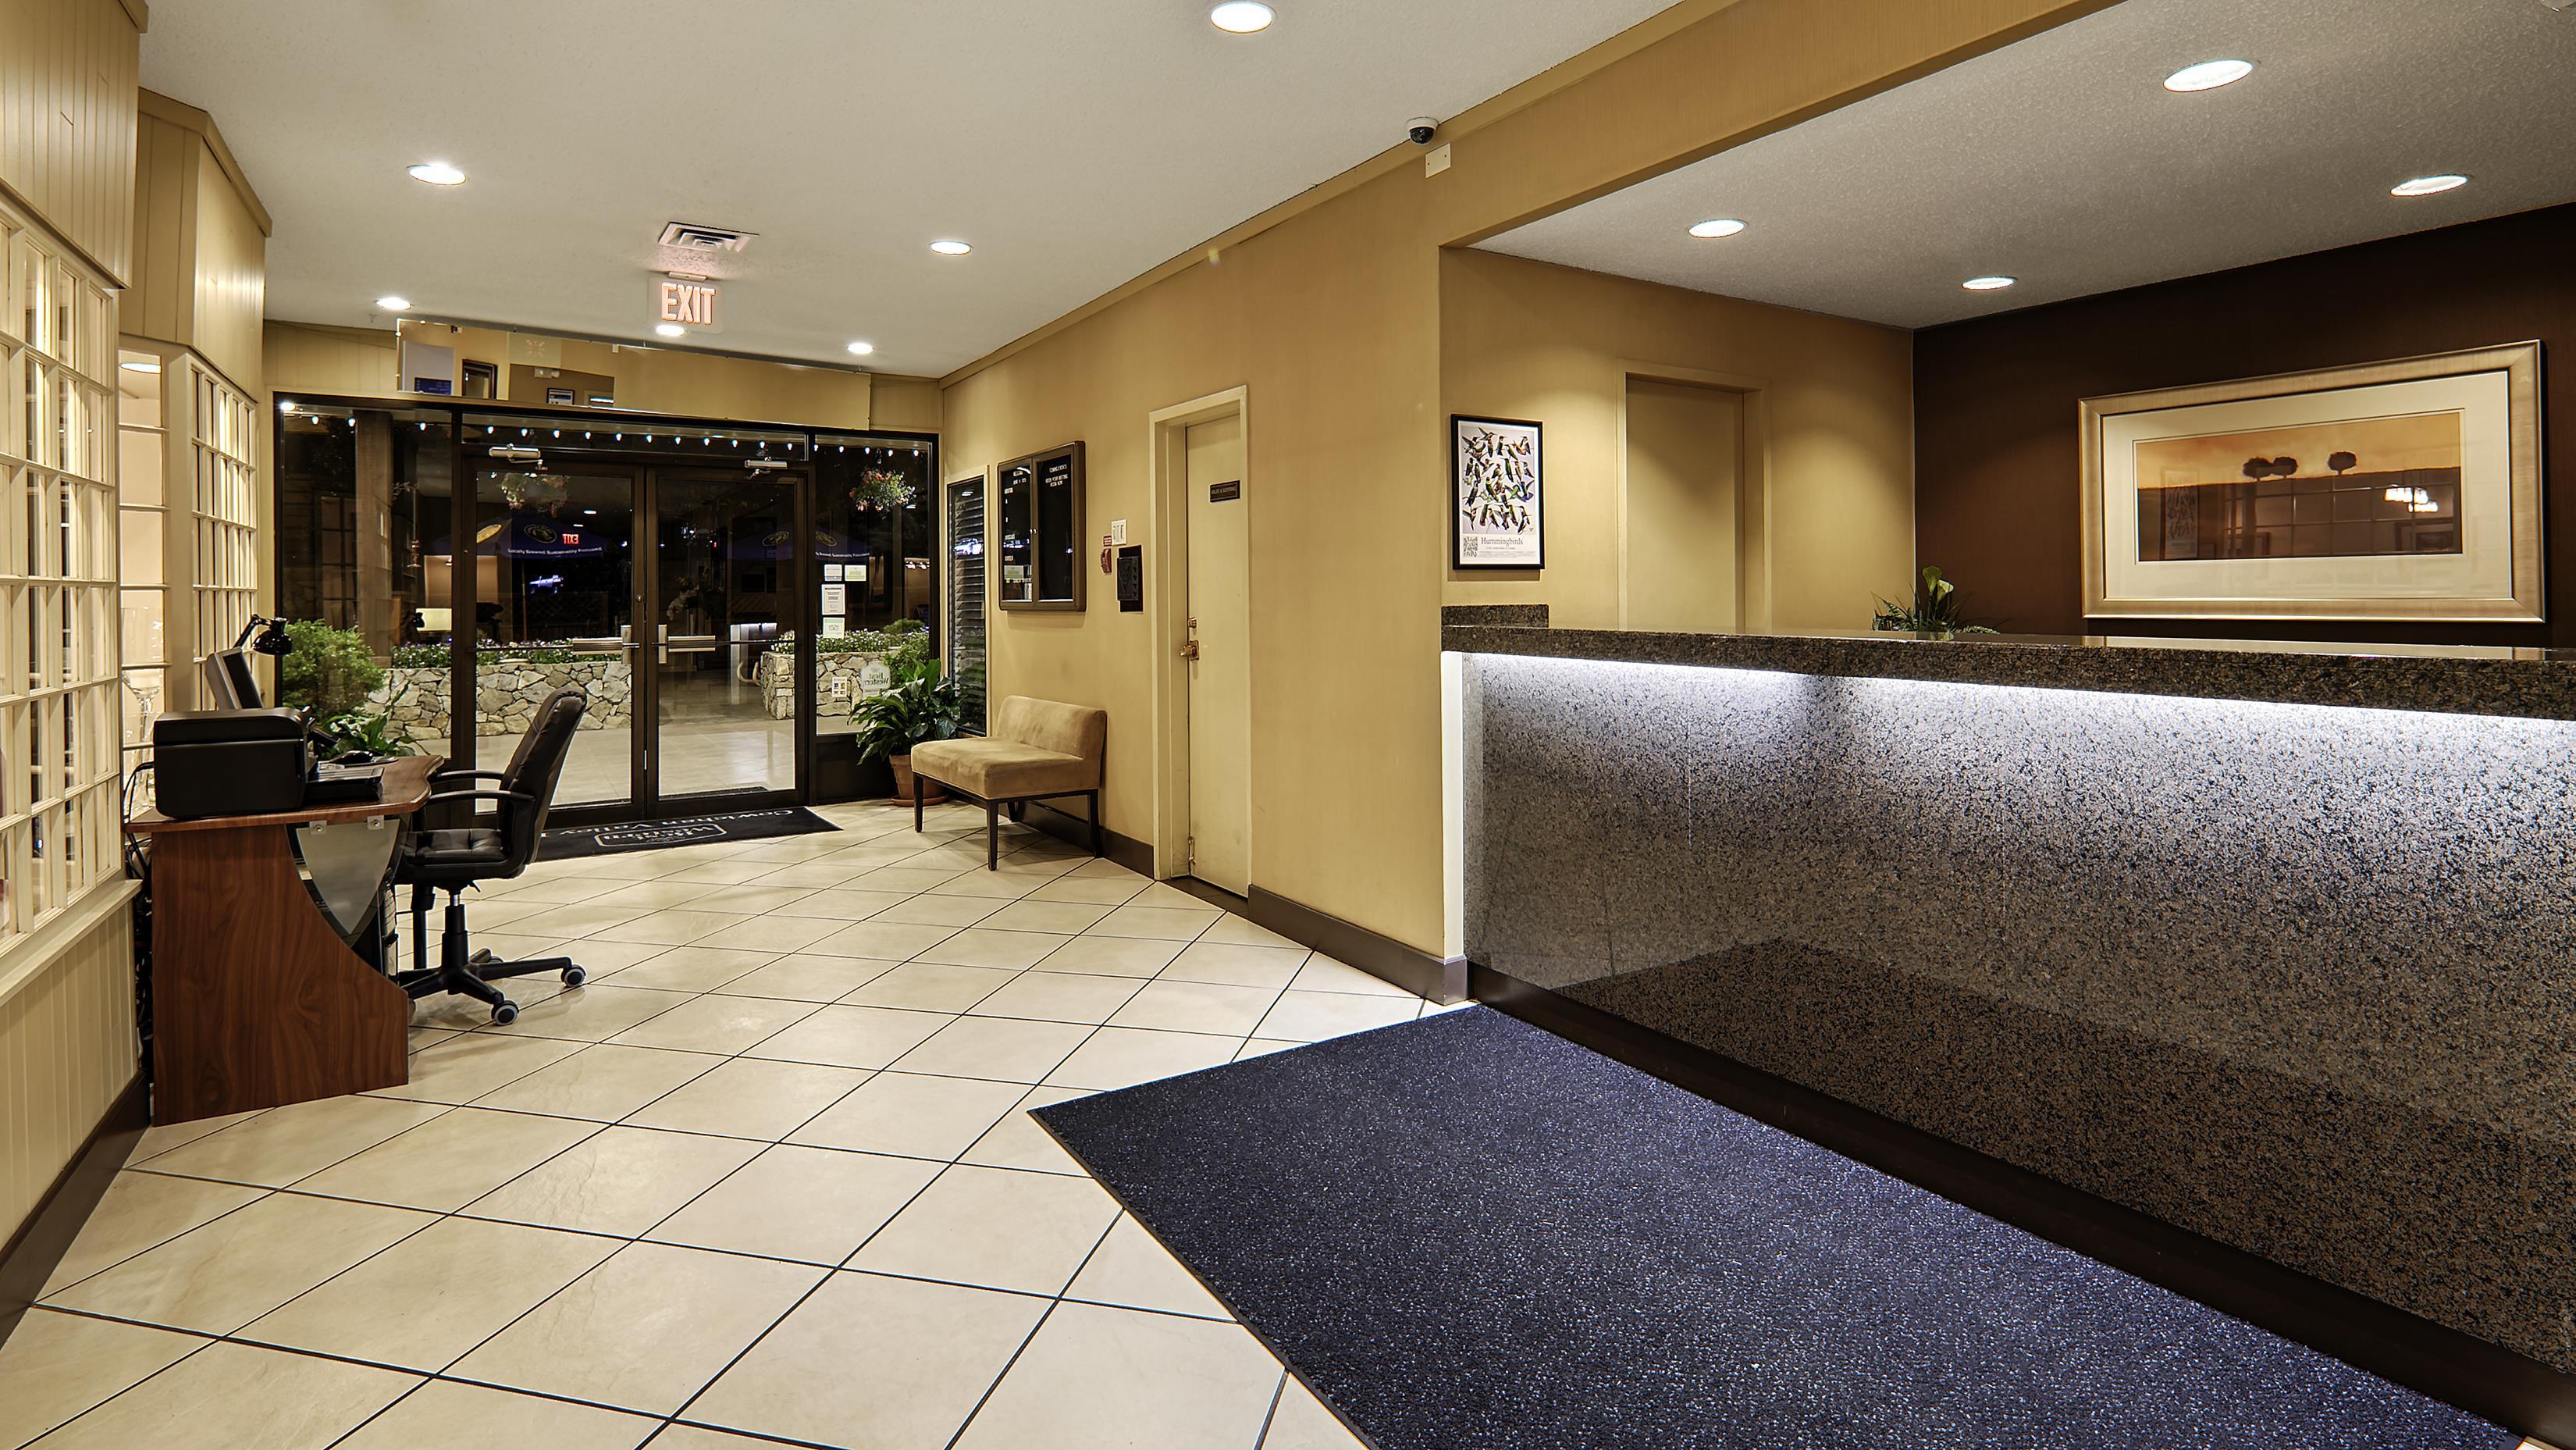 Best Western Cowichan Valley Inn in Duncan: Lobby